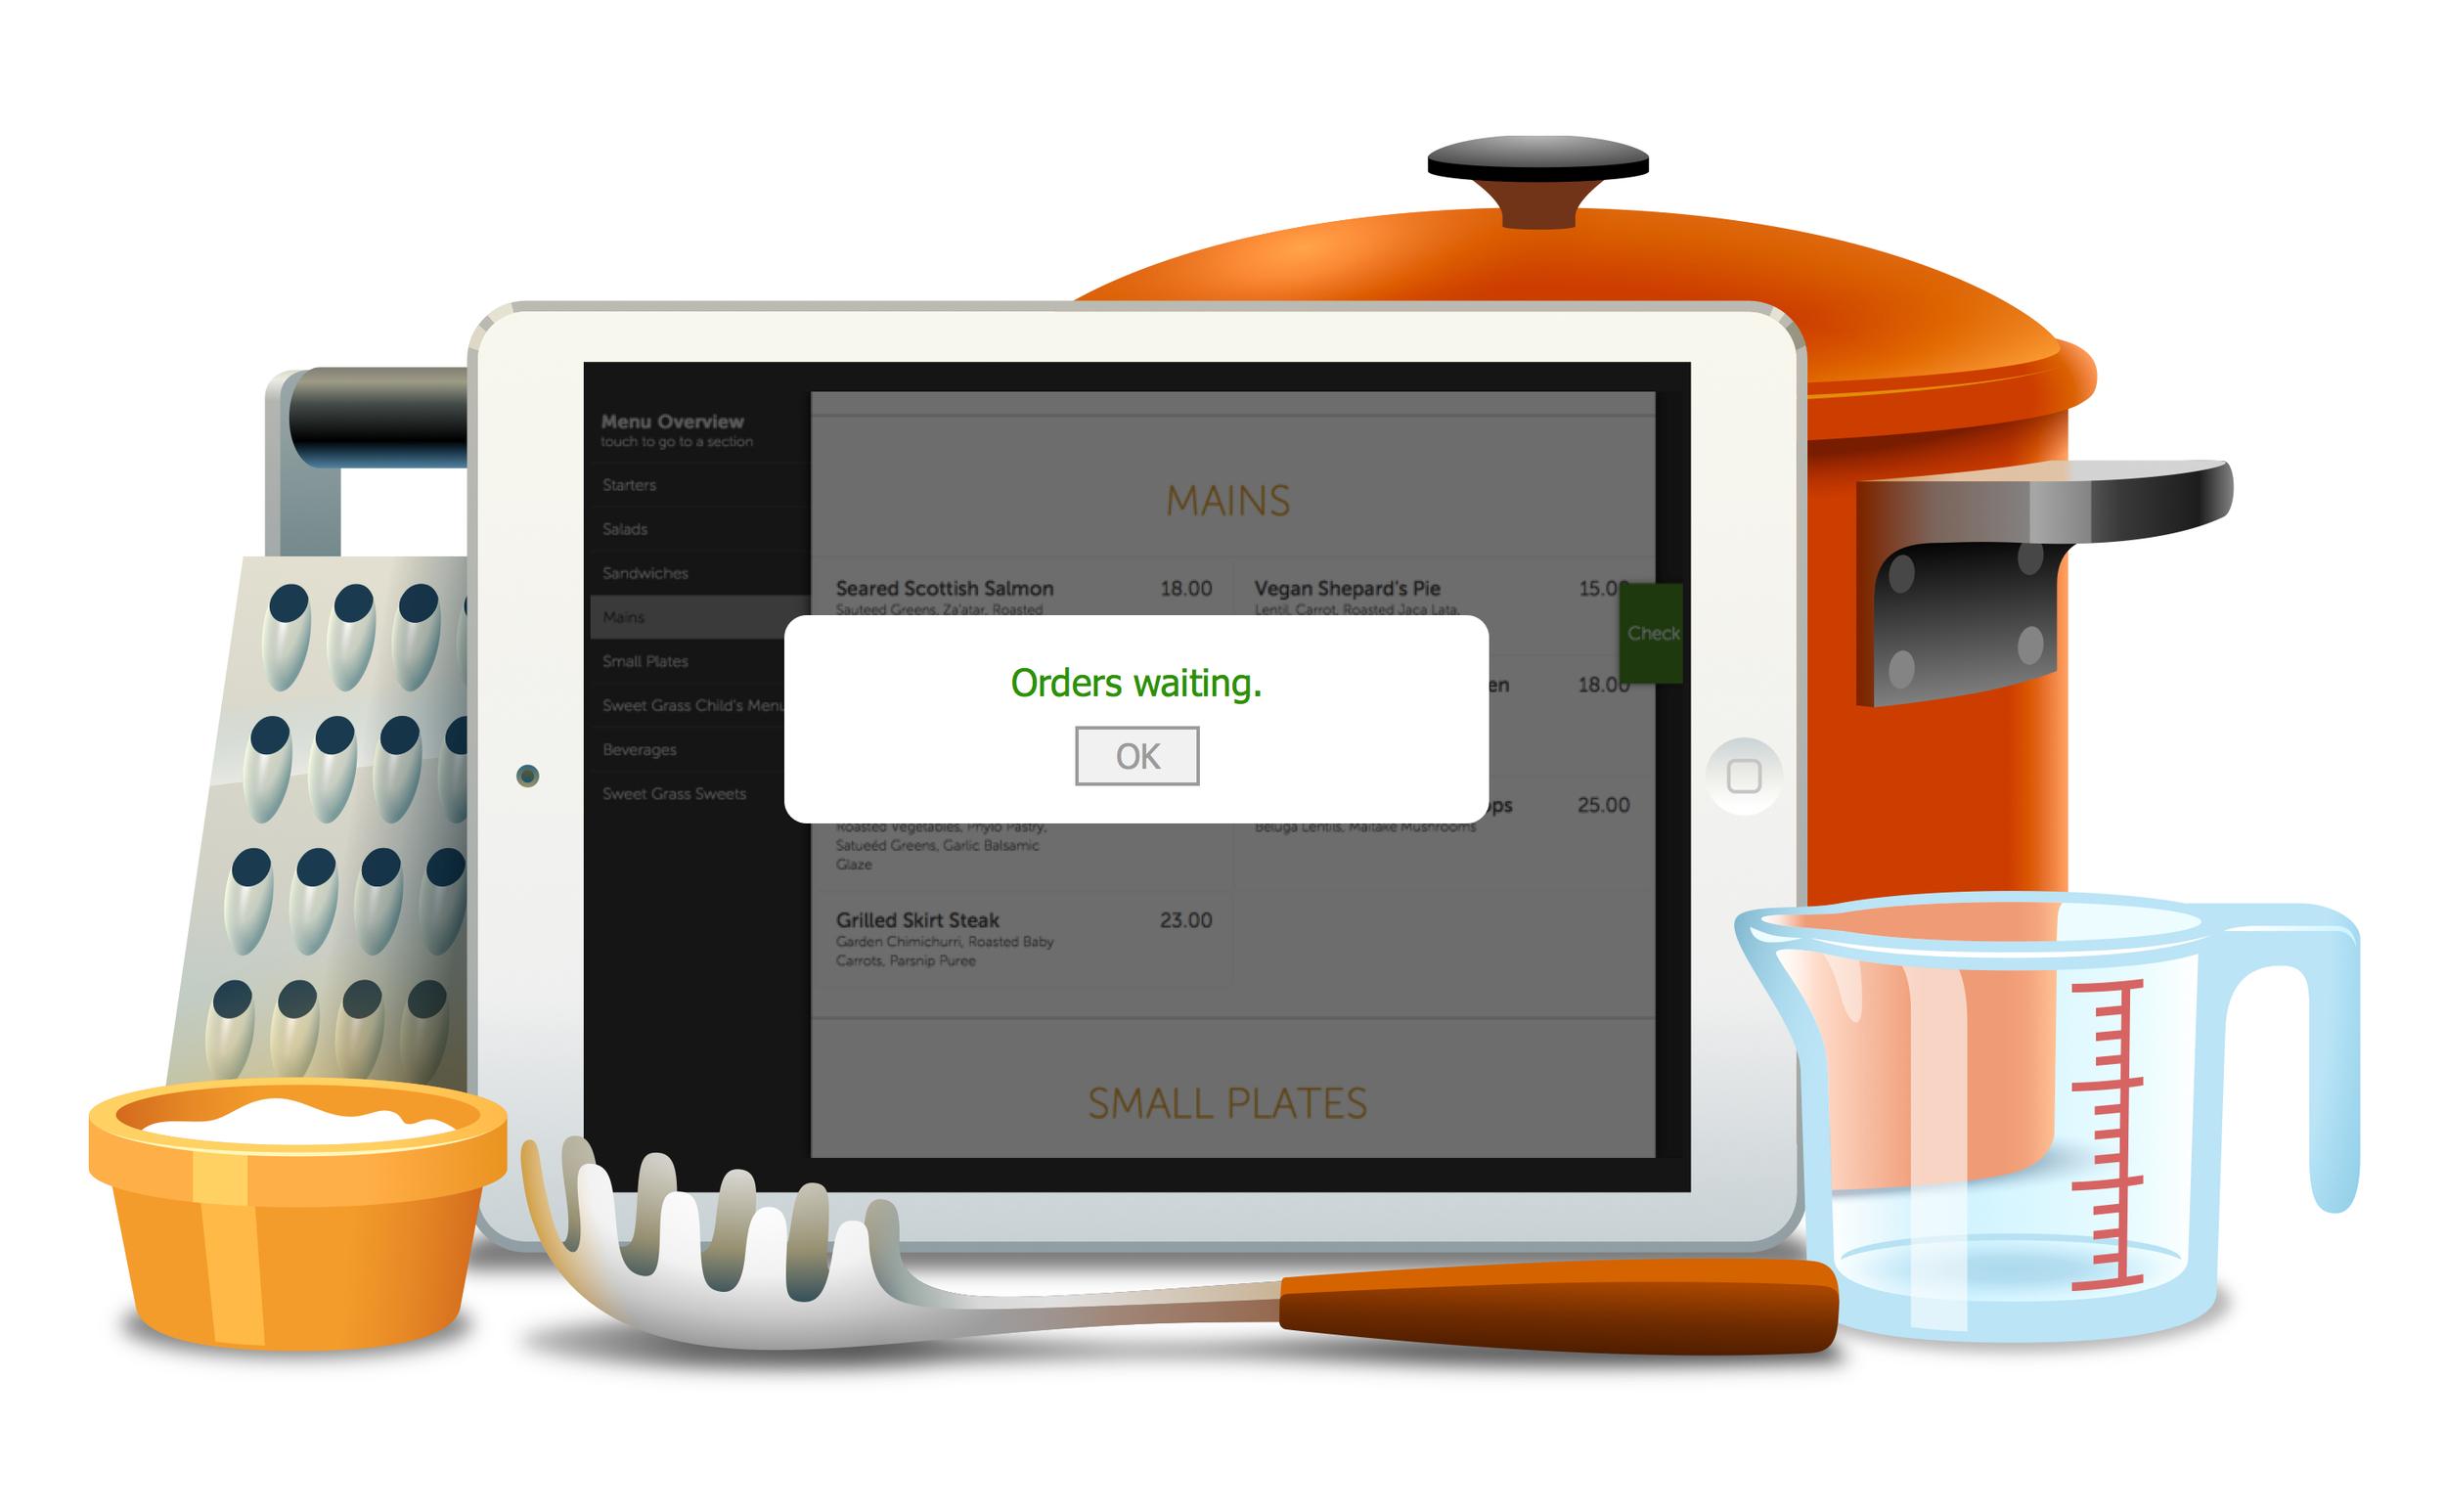 iPad-Utensils.jpg